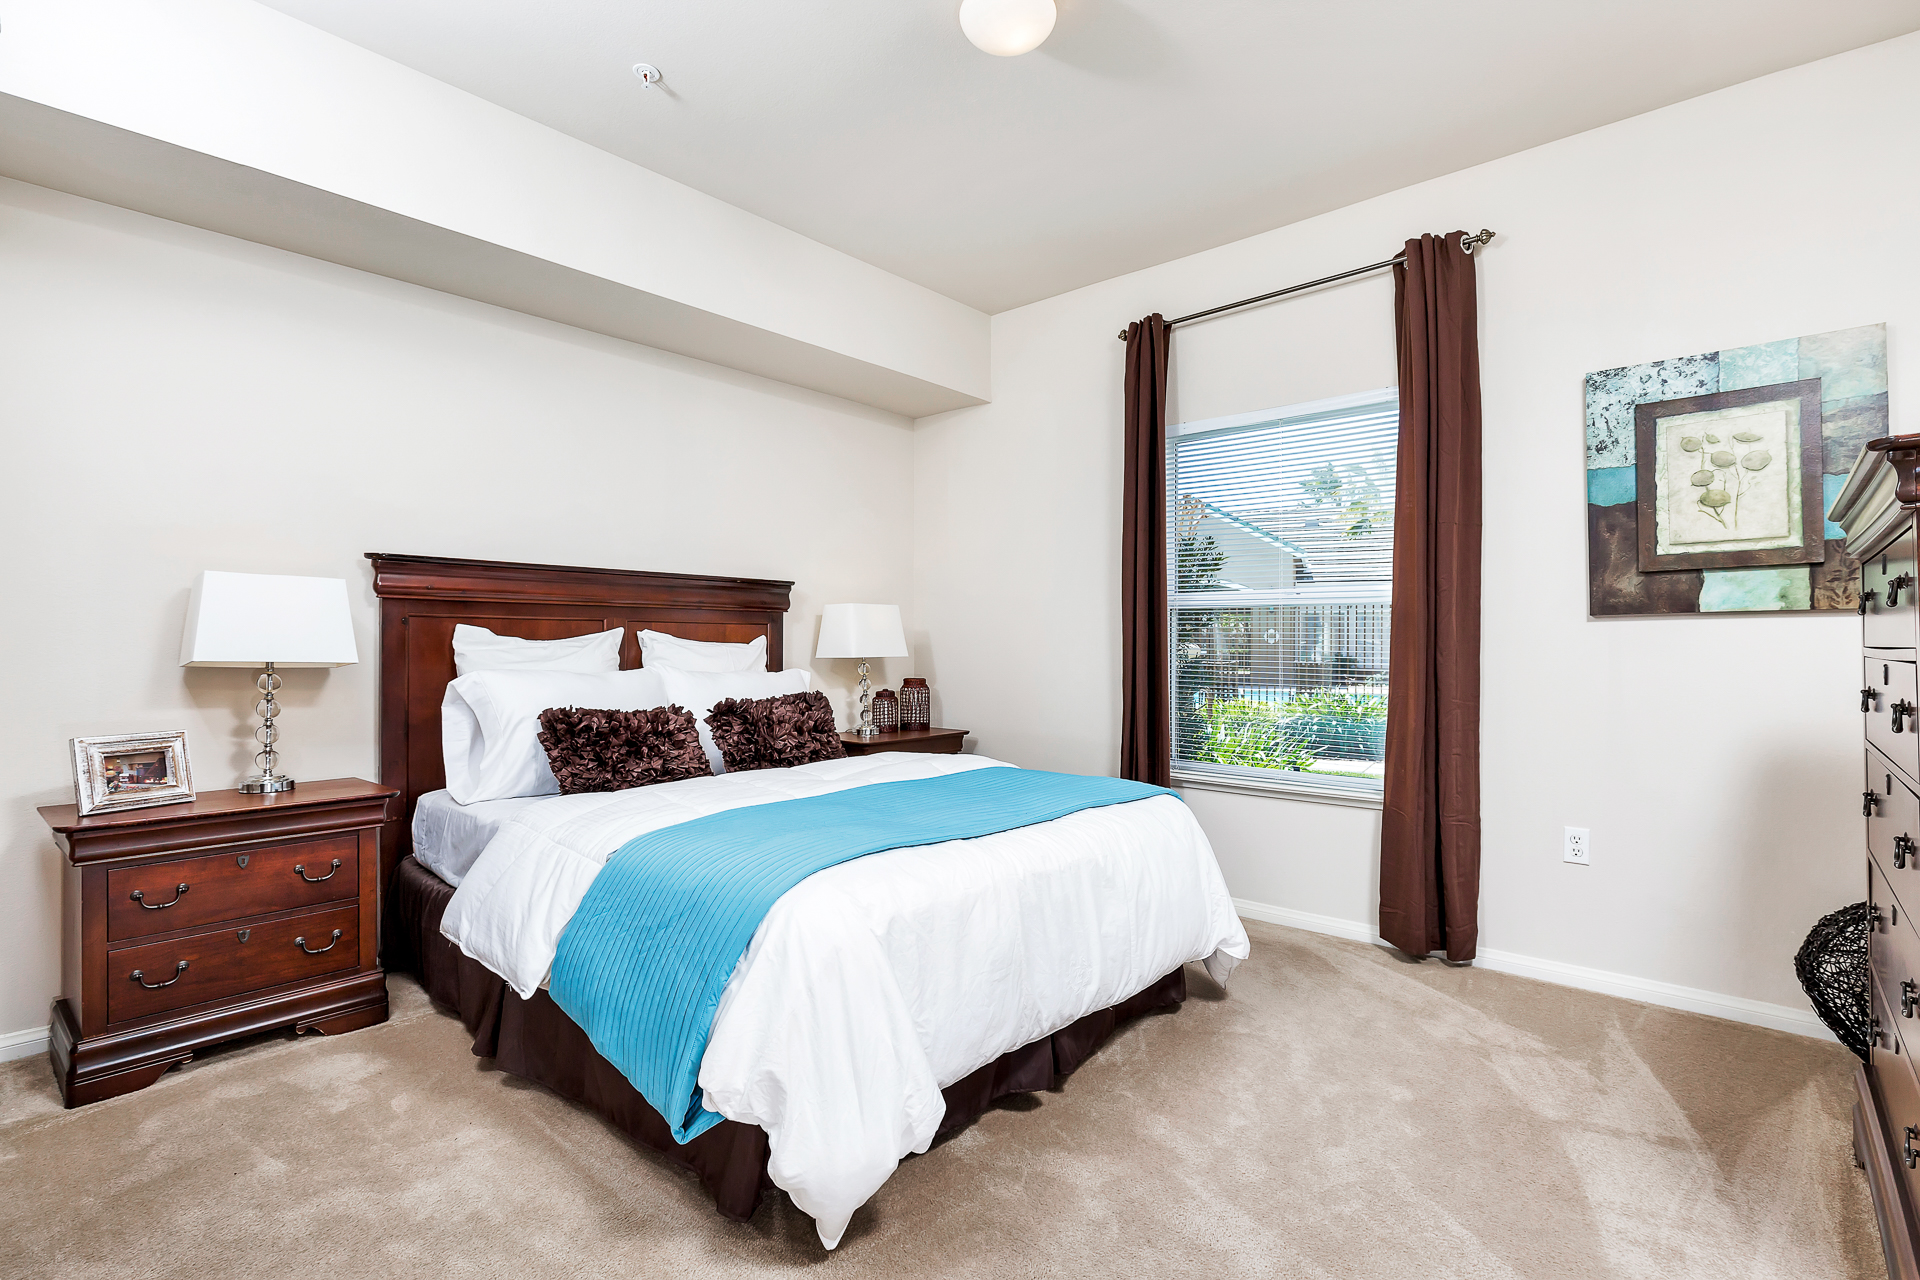 29-Sycamore-Terrace-Apartments-Photo-by-Brad-Ahlm-FairMarketPhoto-FullRes.jpg